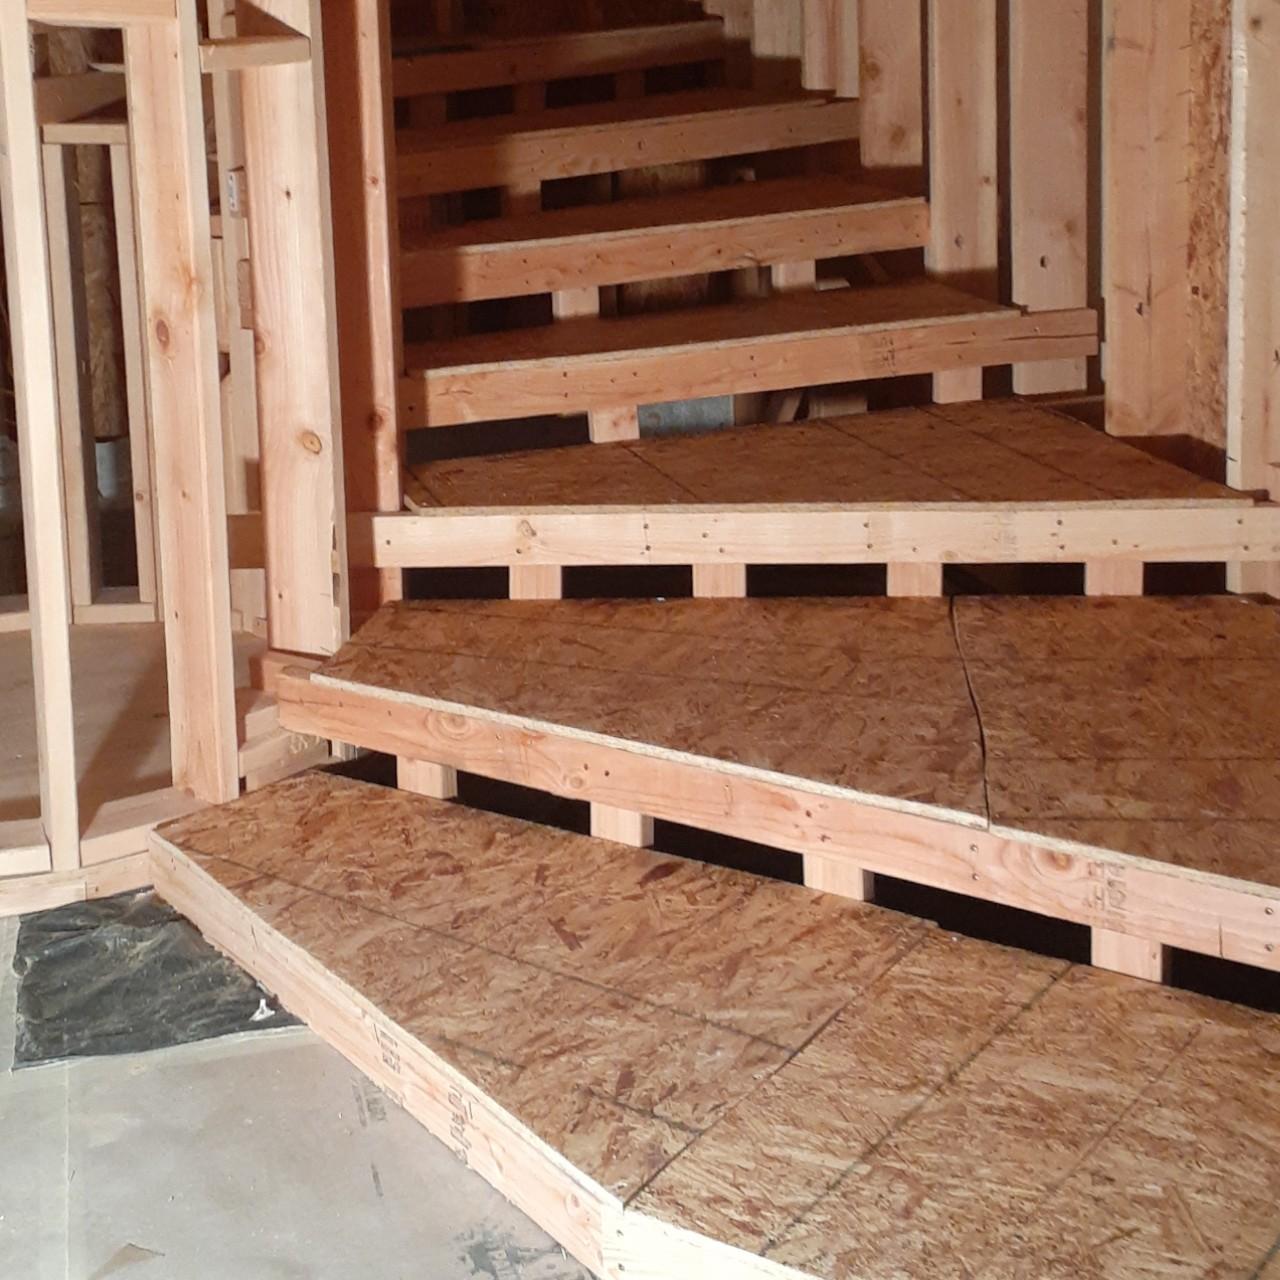 carpentry-wood-framing-second-floor-home-addition--framing-30